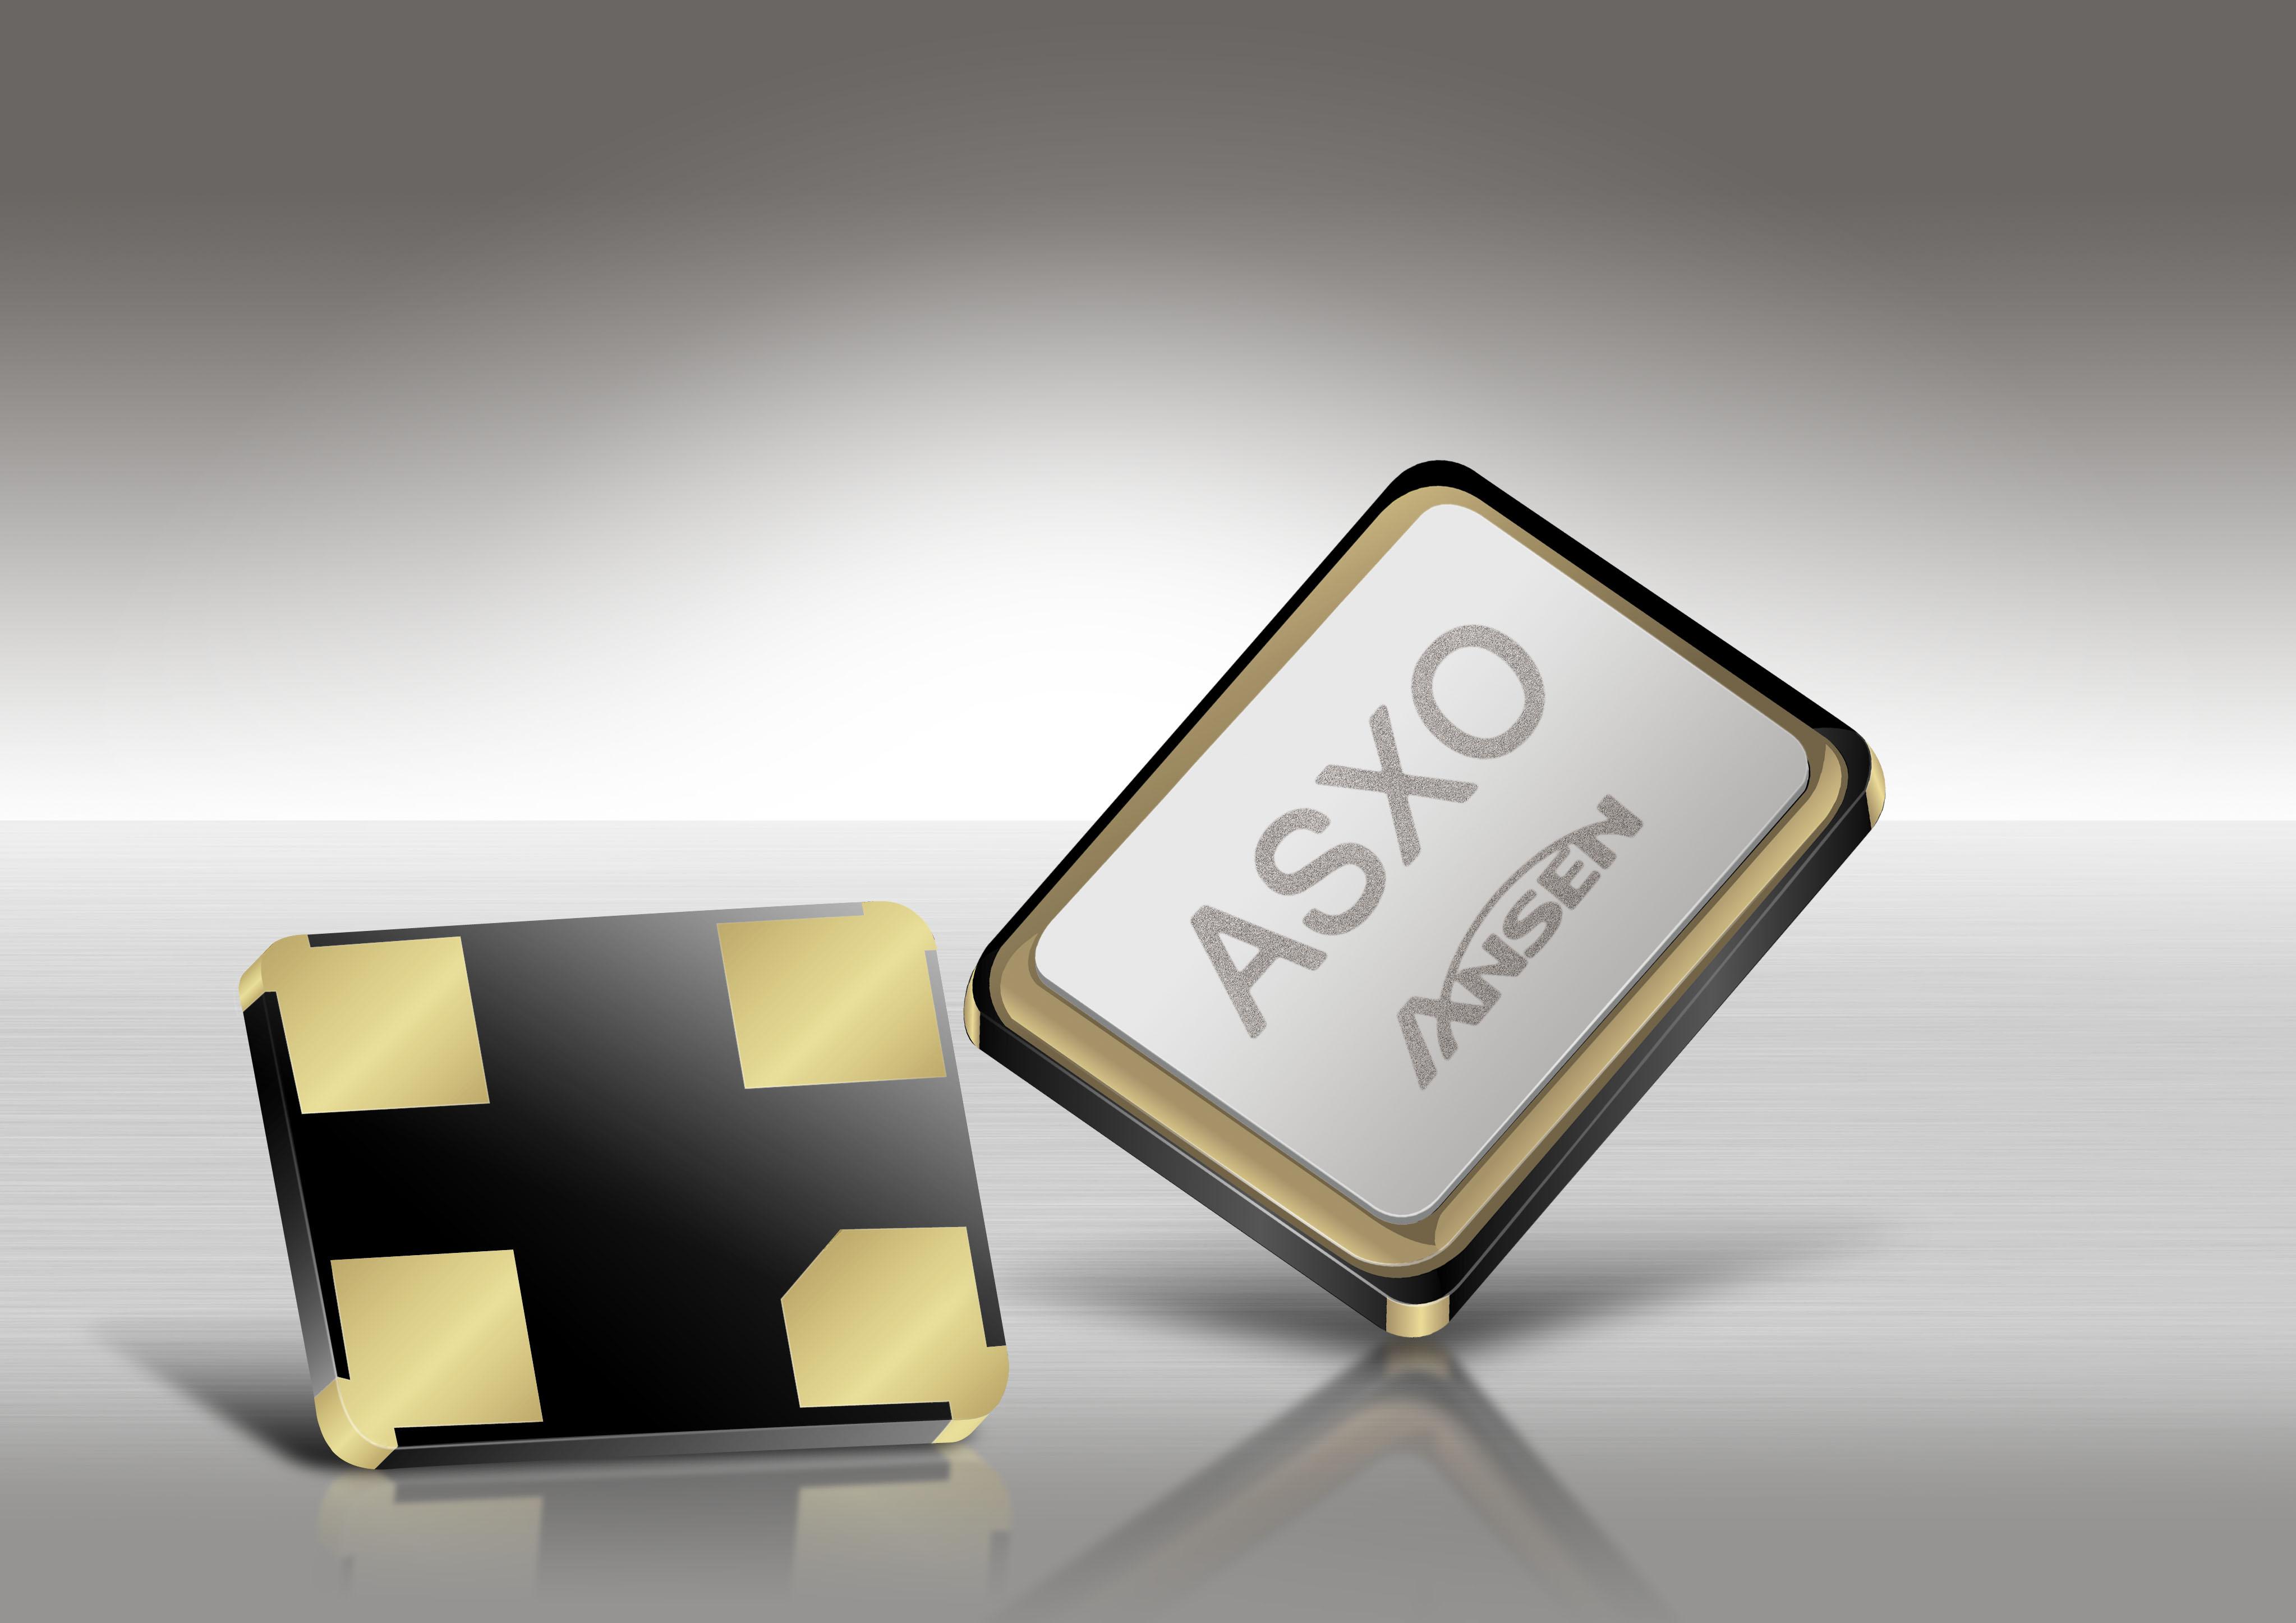 Auto-grade Quartz Crystal Oscillator